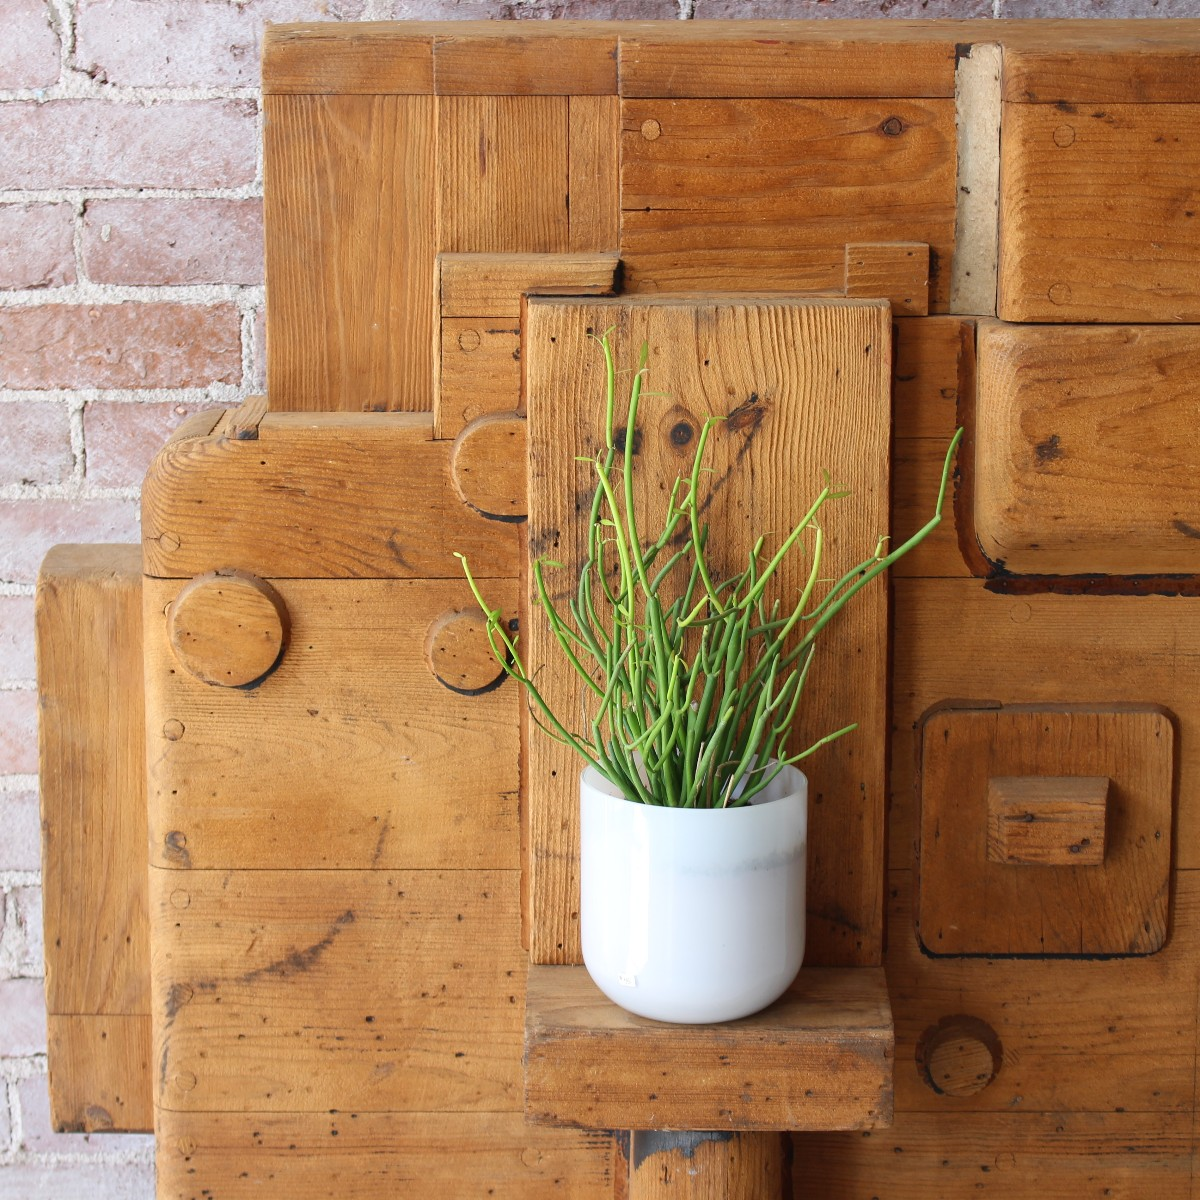 sticks and bricks wooden industrial mold